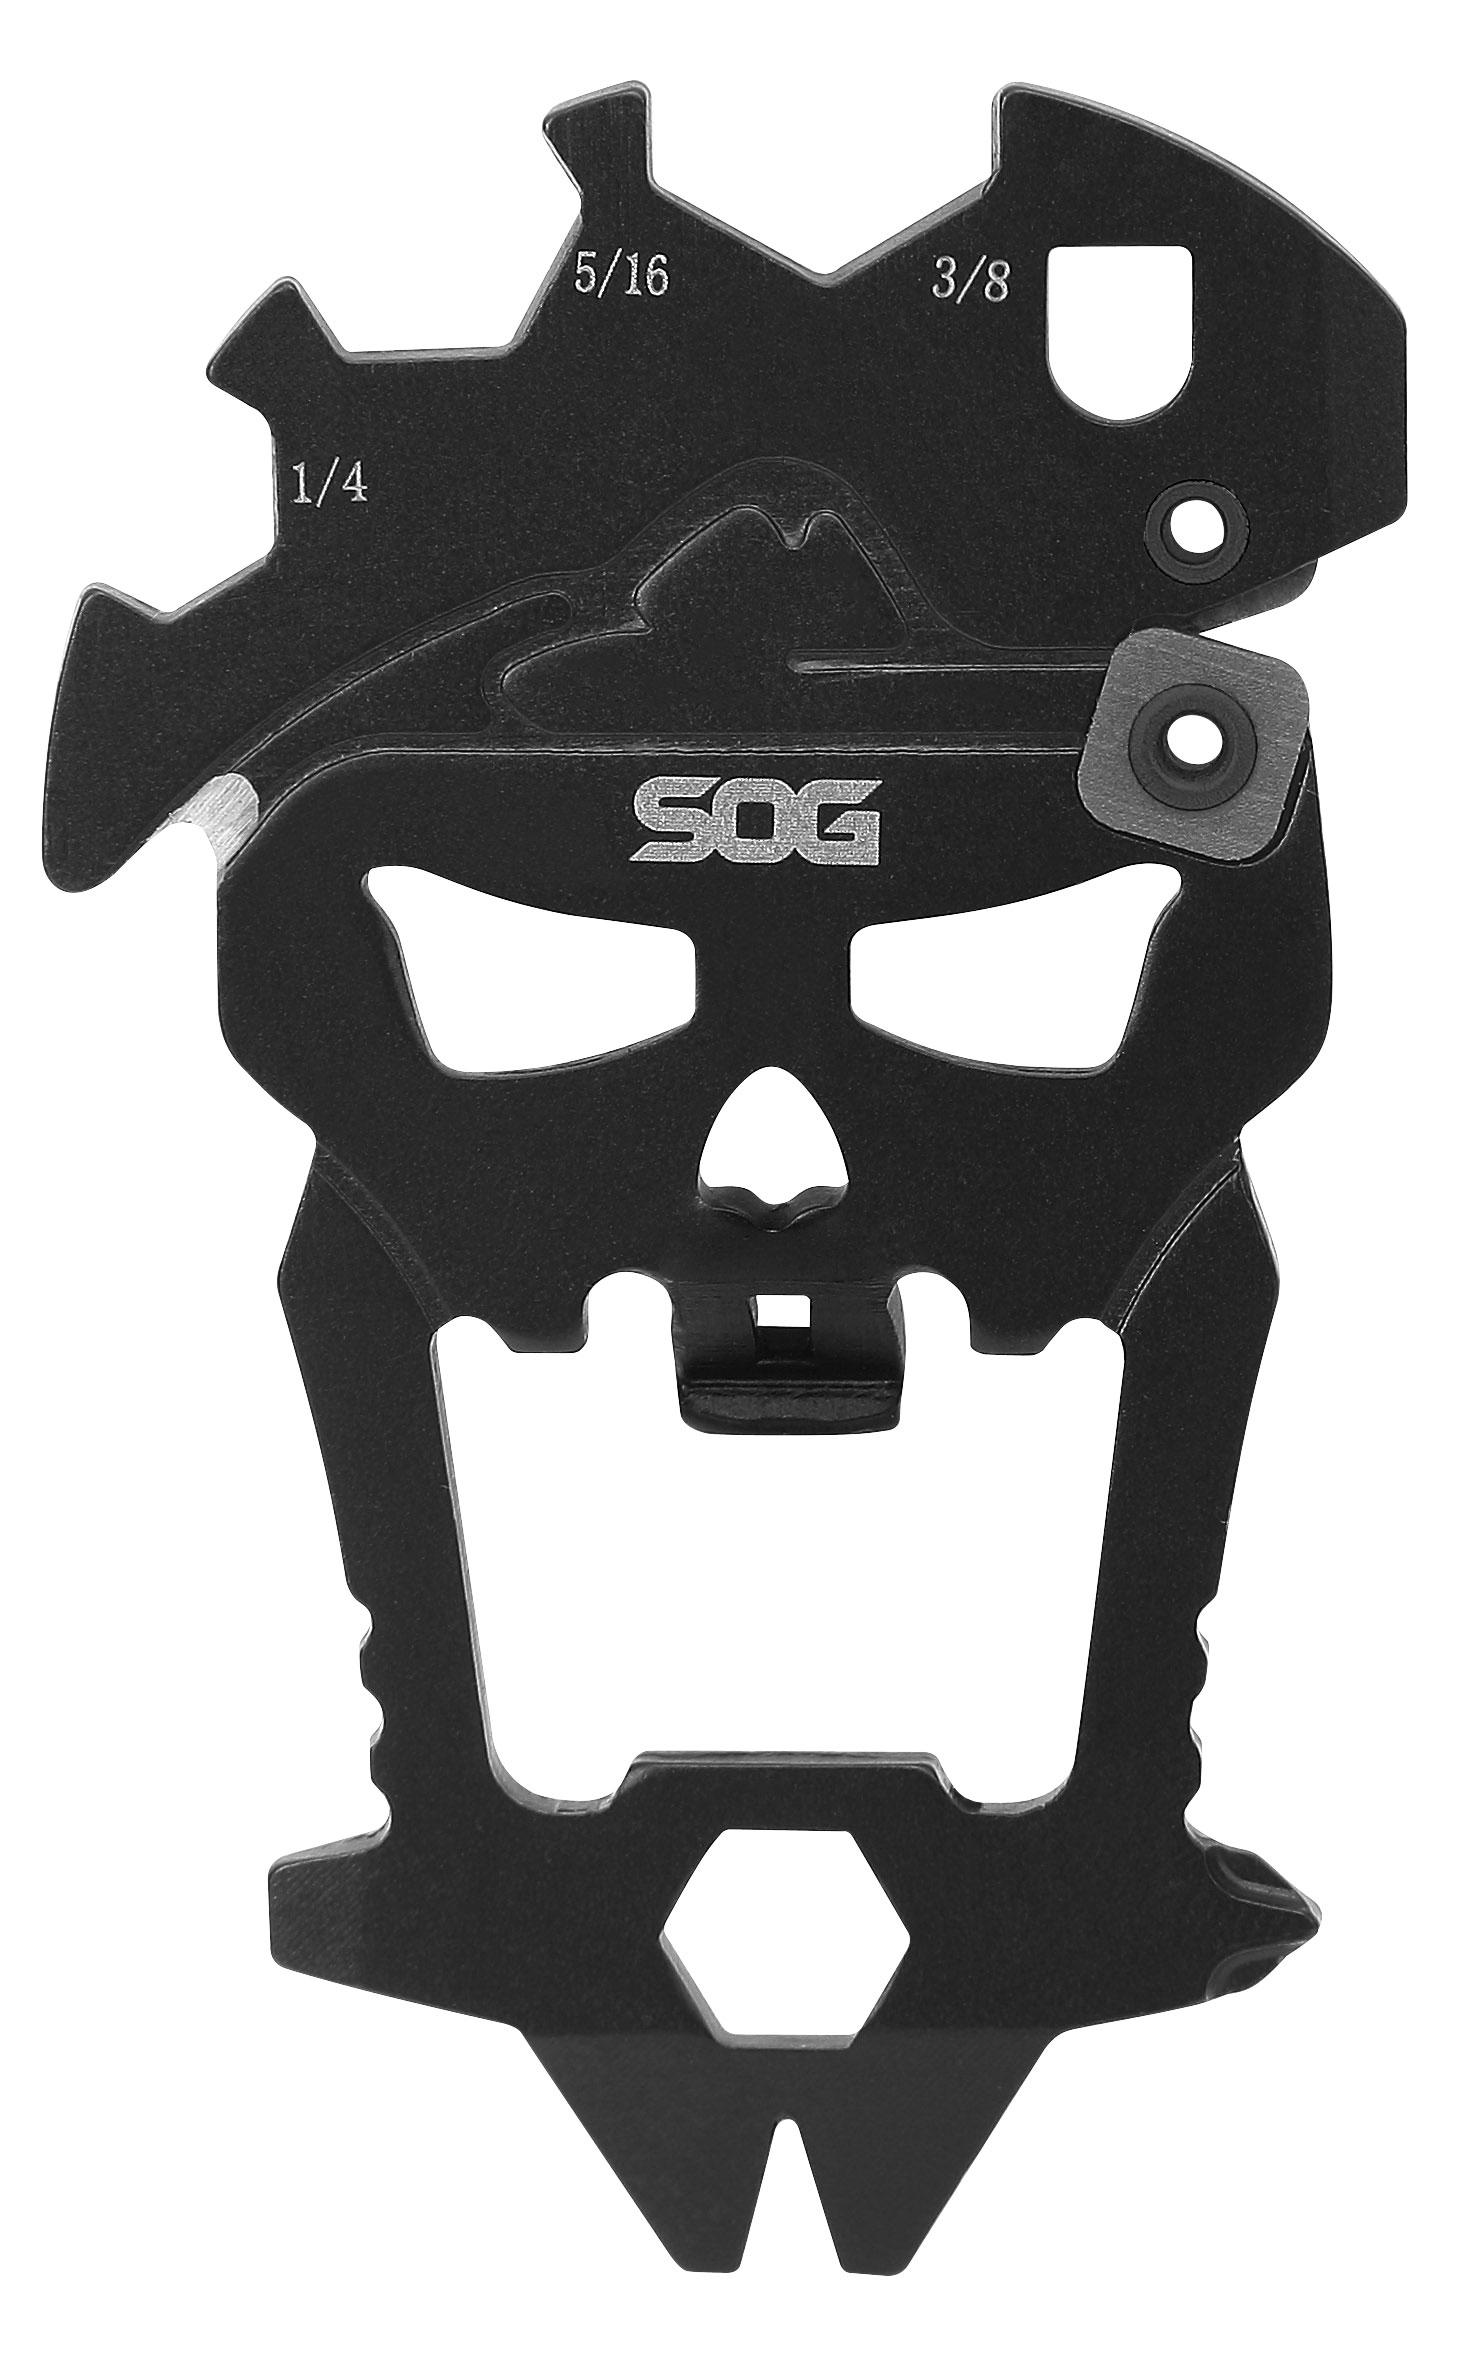 SOG MacV Tool, 12 Component Skull Multi-Tool, 2.5 inch Overall